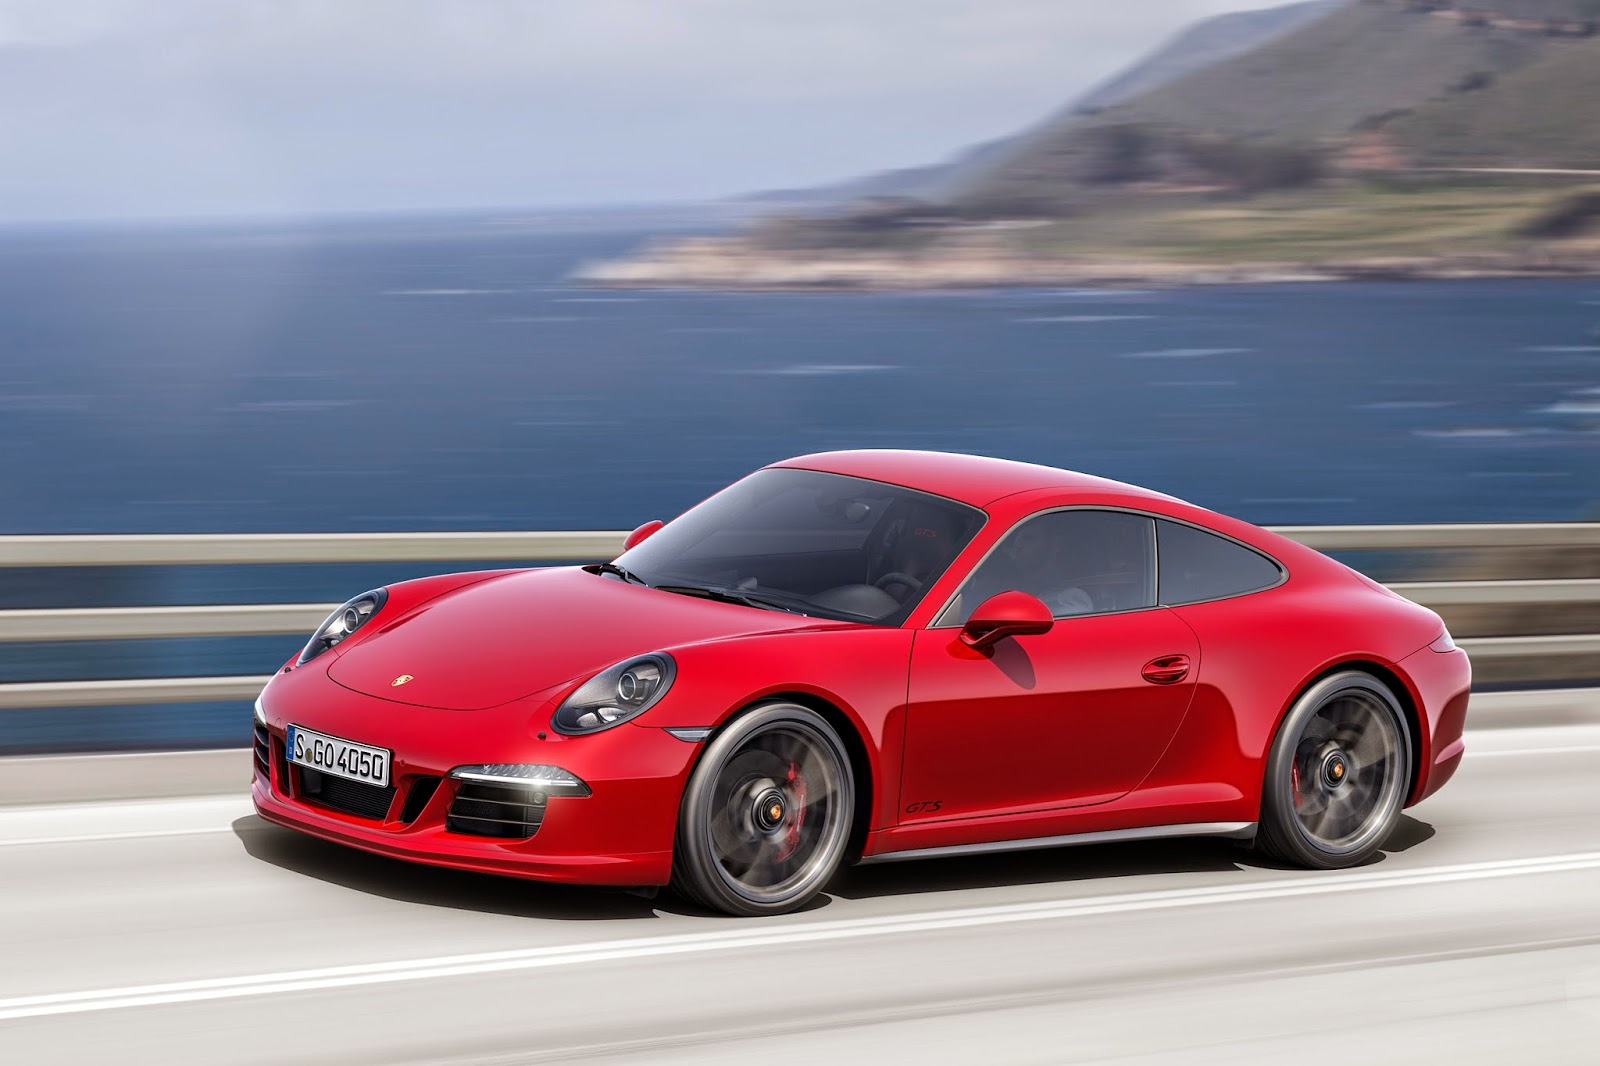 2014 Porsche 911 Carrera GTS